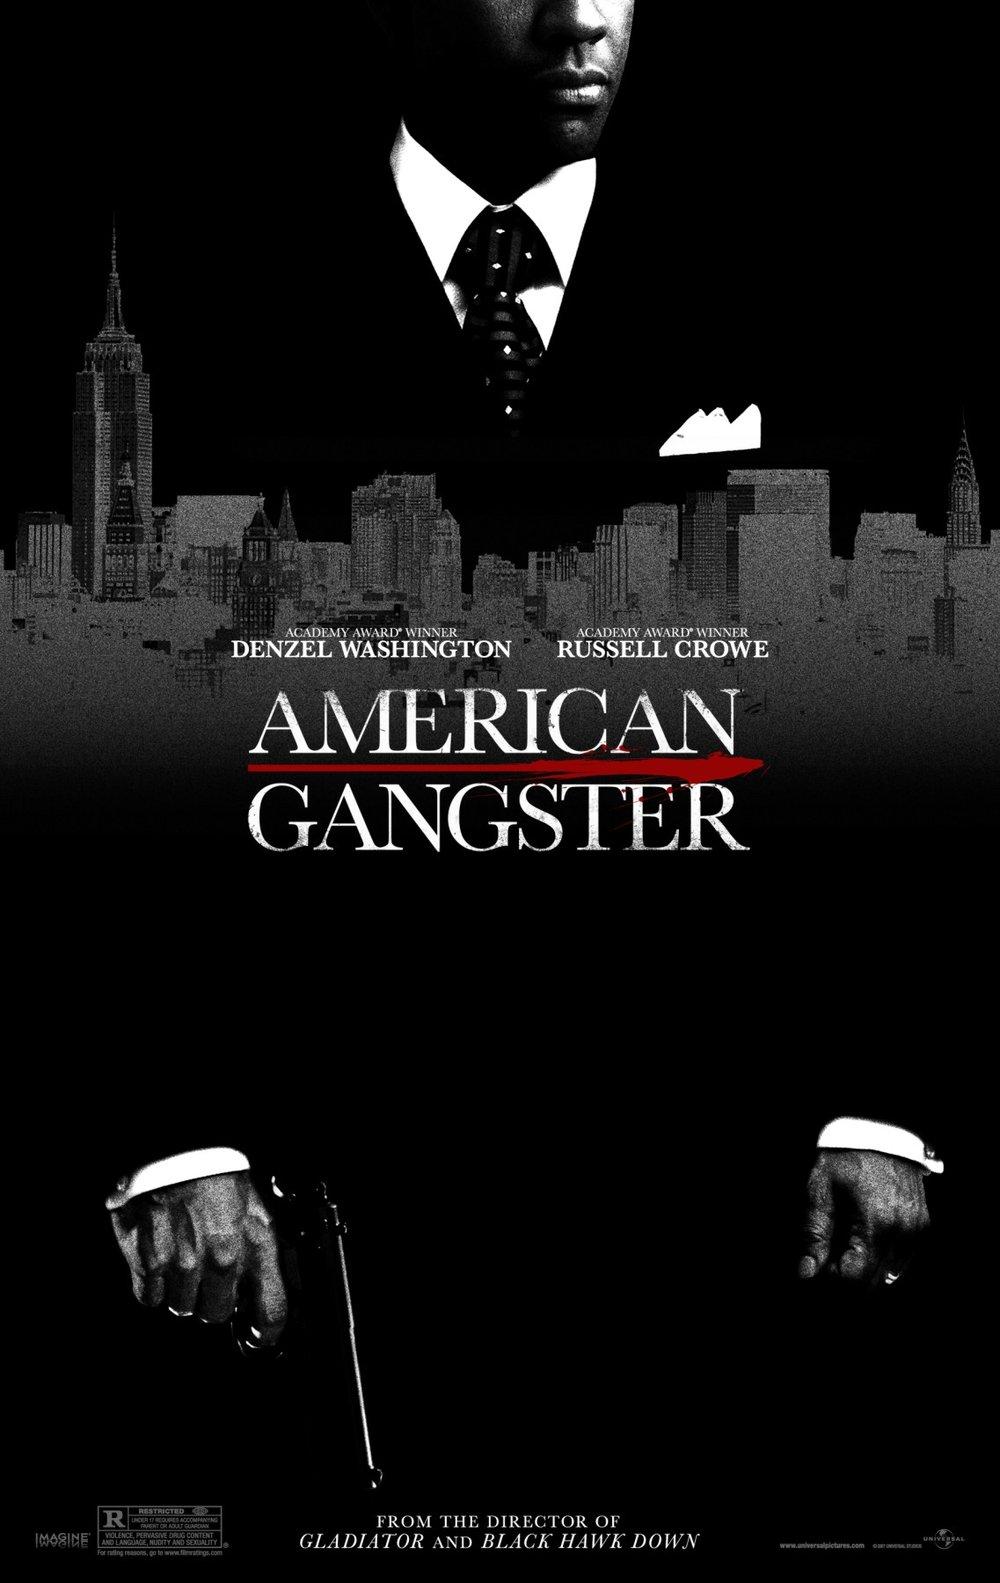 American_Gangster_poster_2.jpg